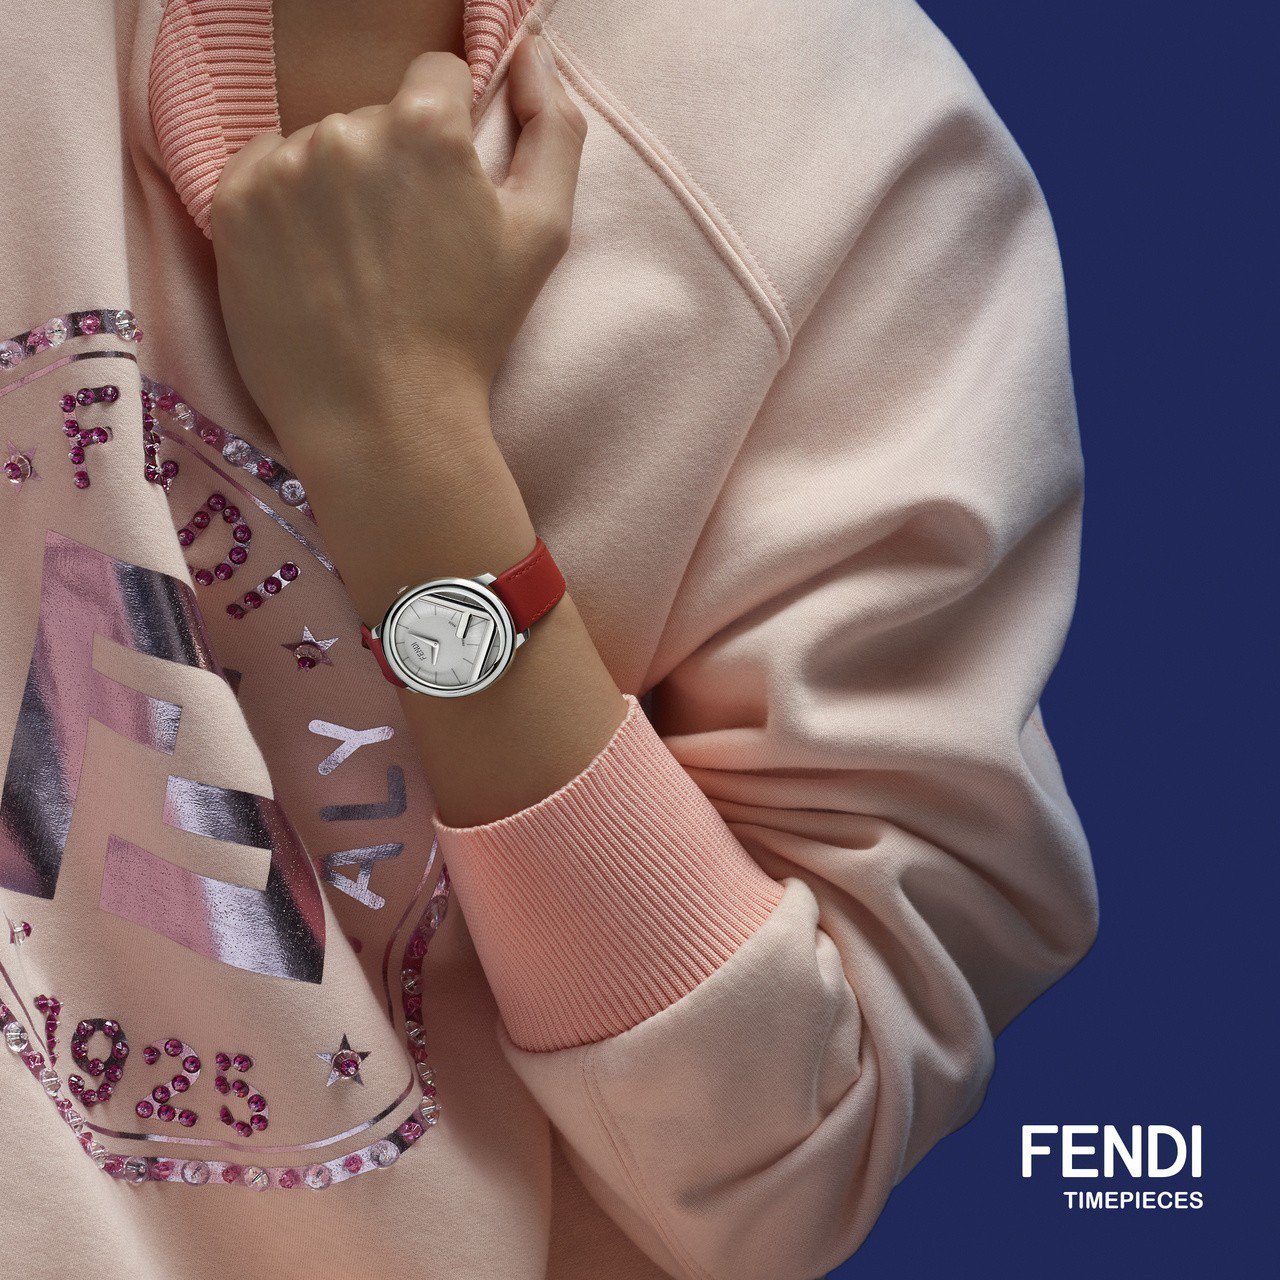 Fendi今年主打Run Away系列腕表,表面上有顯眼的F is Fendi標...